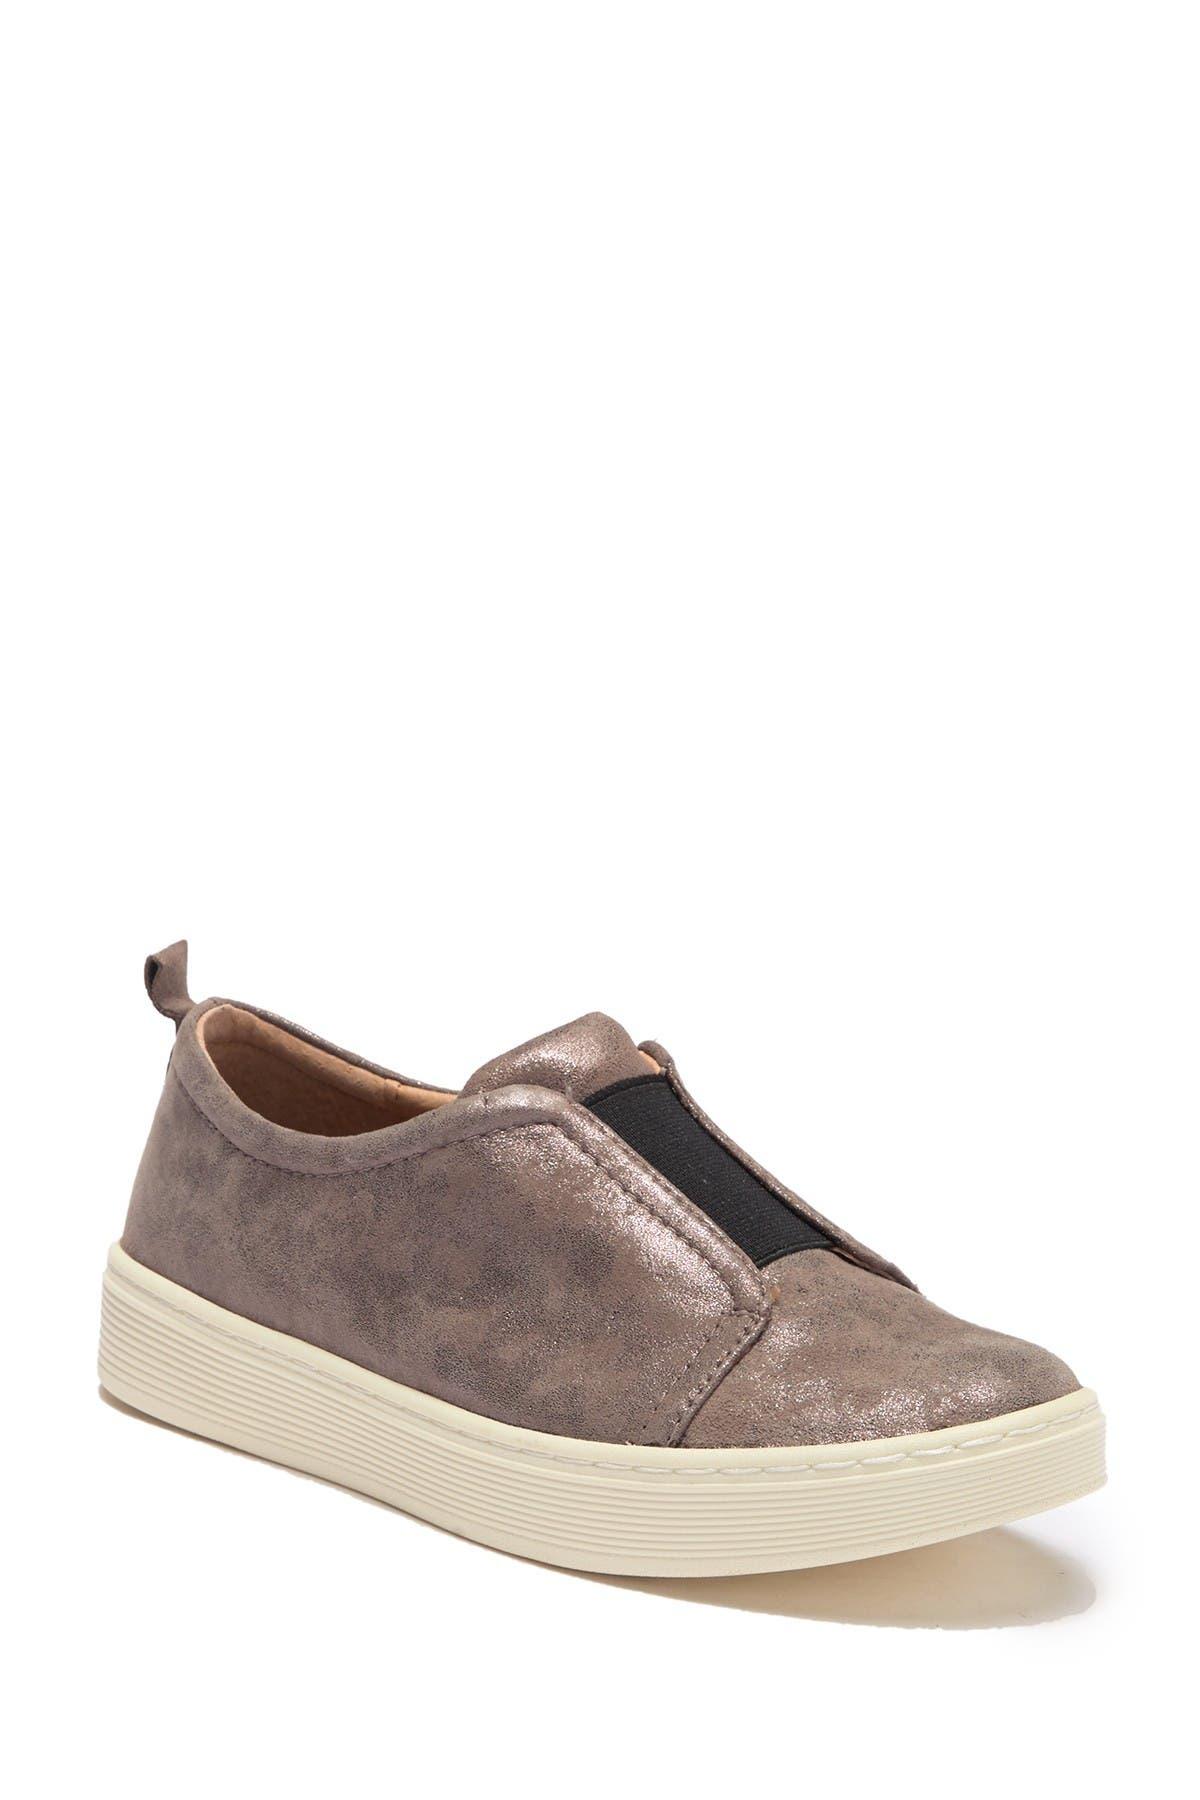 Sofft   Safia Slip-On Sneaker